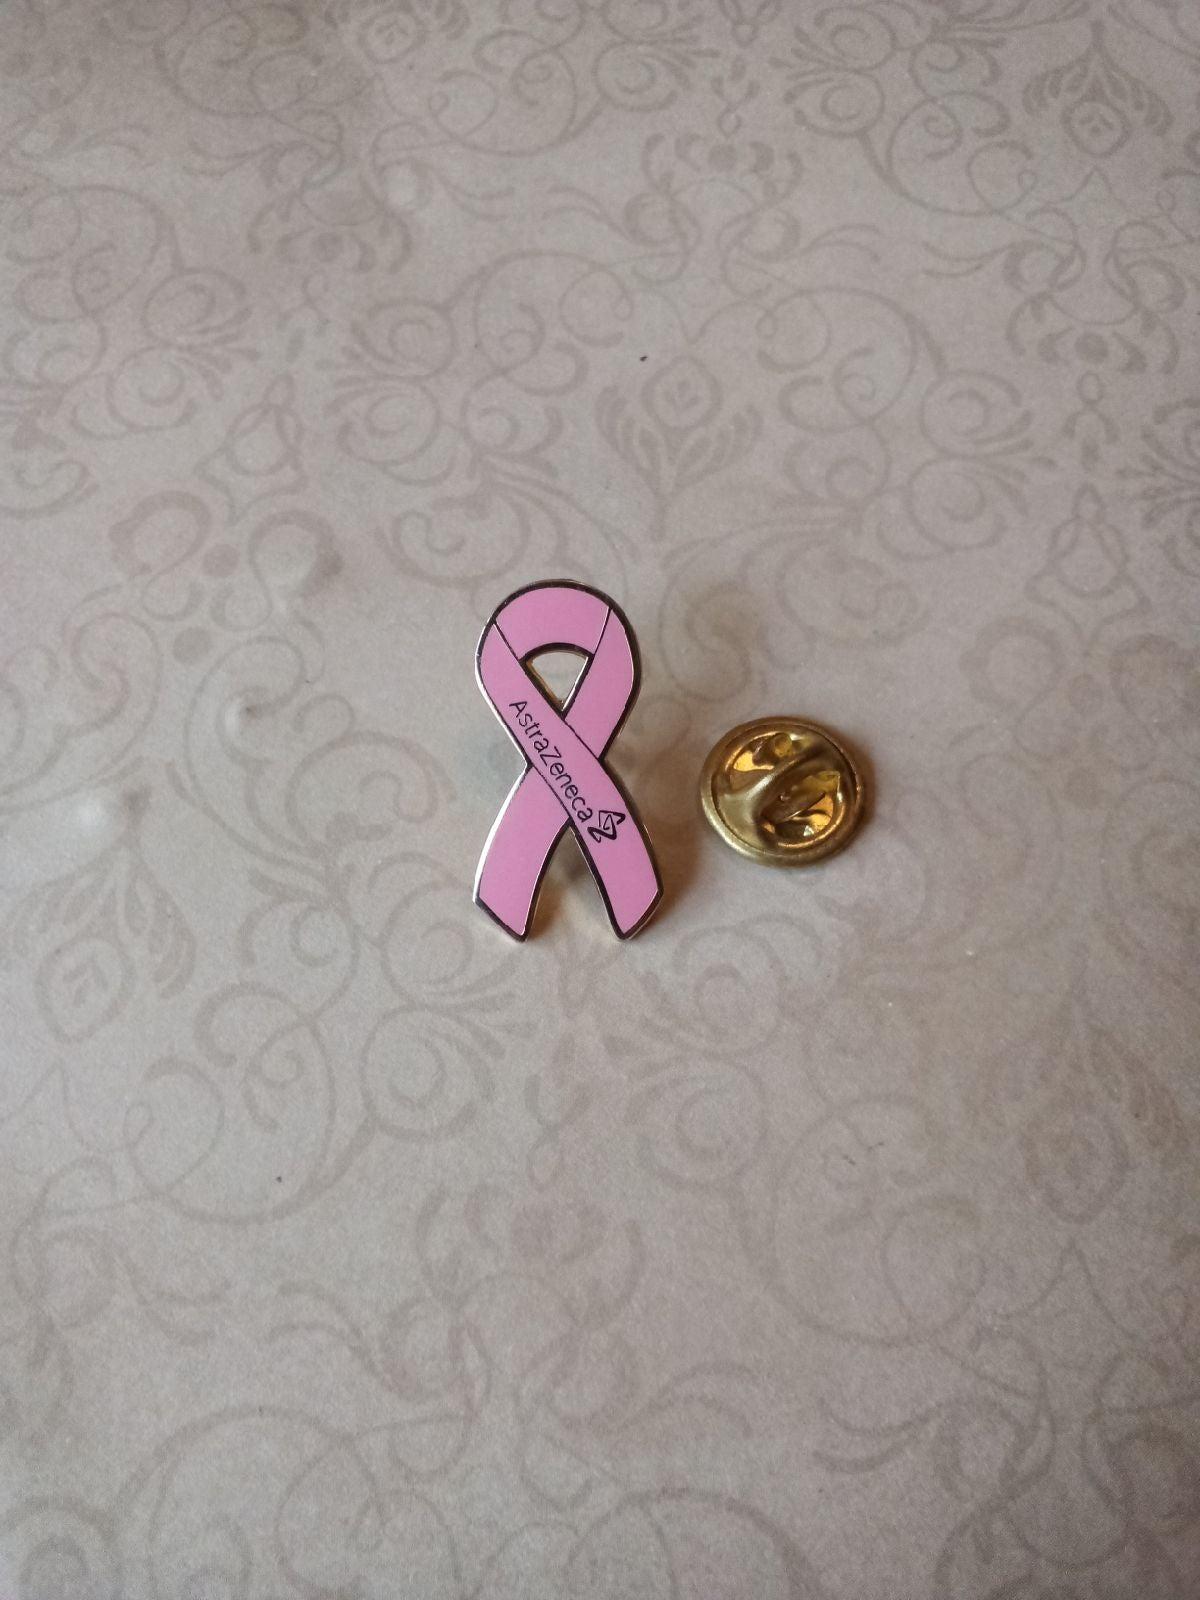 Astra Zeneca pin